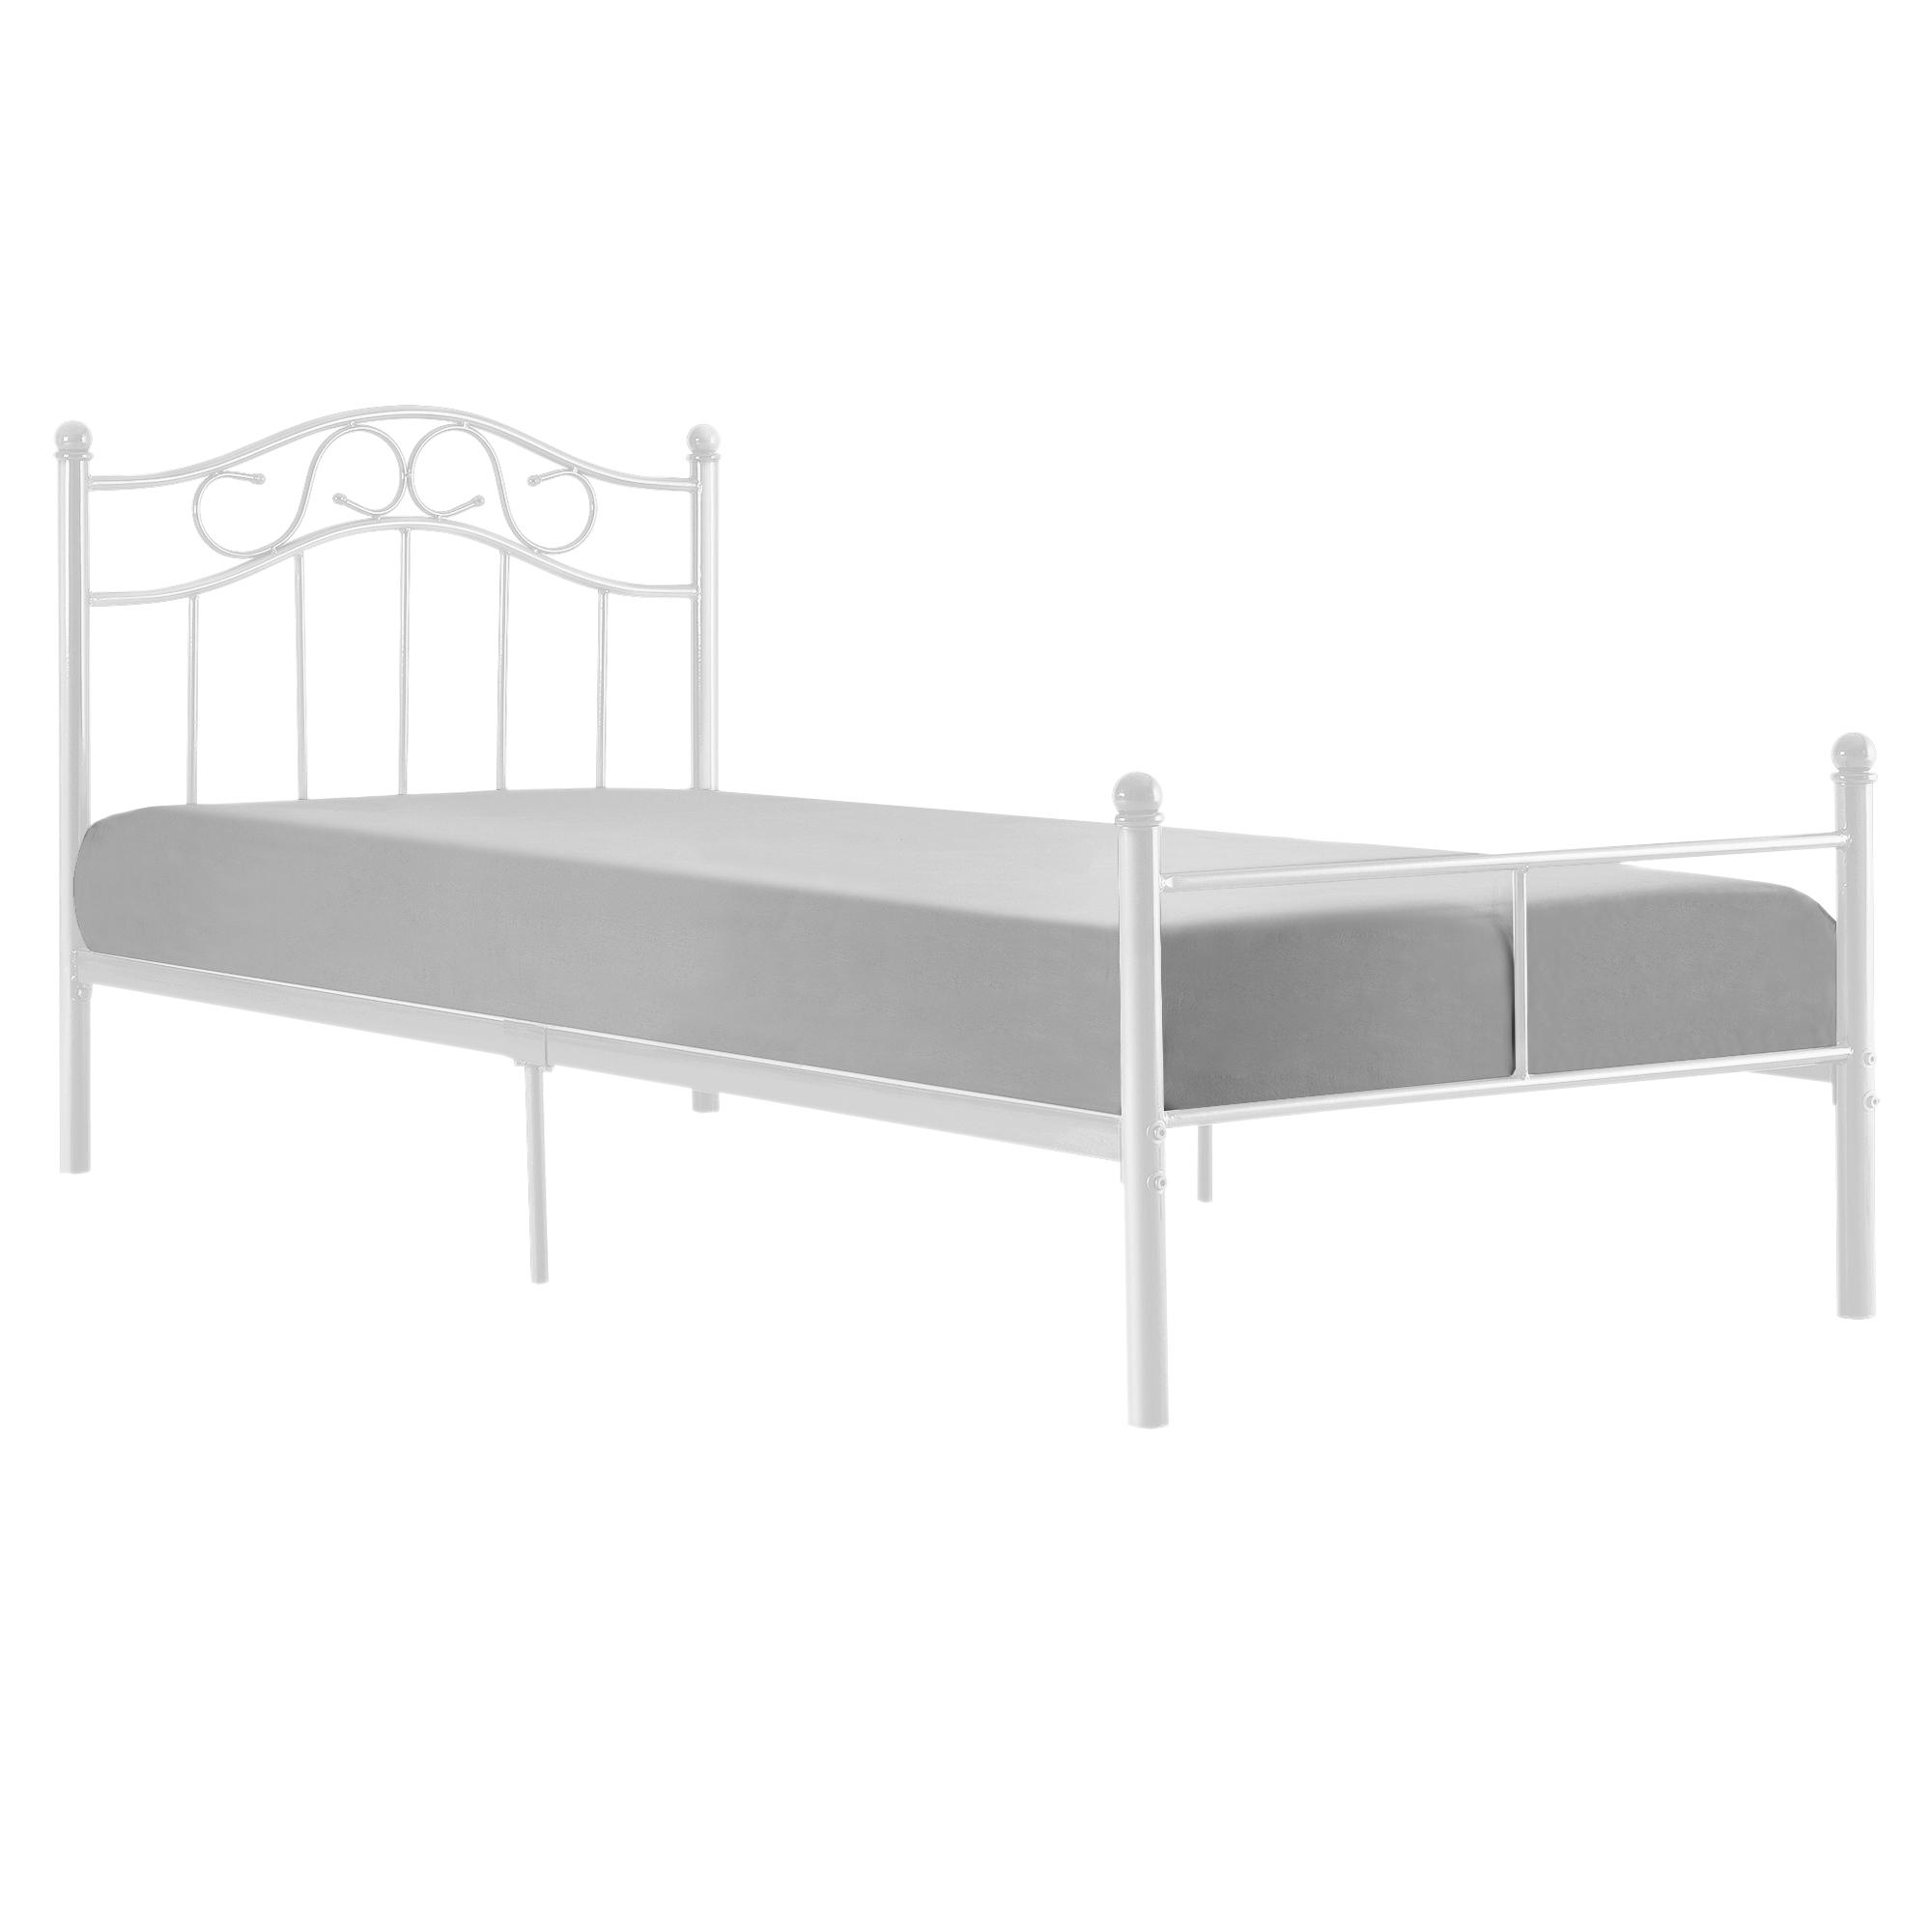 Full Size of Encasa Metallbett 90x200 Wei Bettgestell Bett Schlafzimmer Weiß 100x200 Betten Wohnzimmer Metallbett 100x200